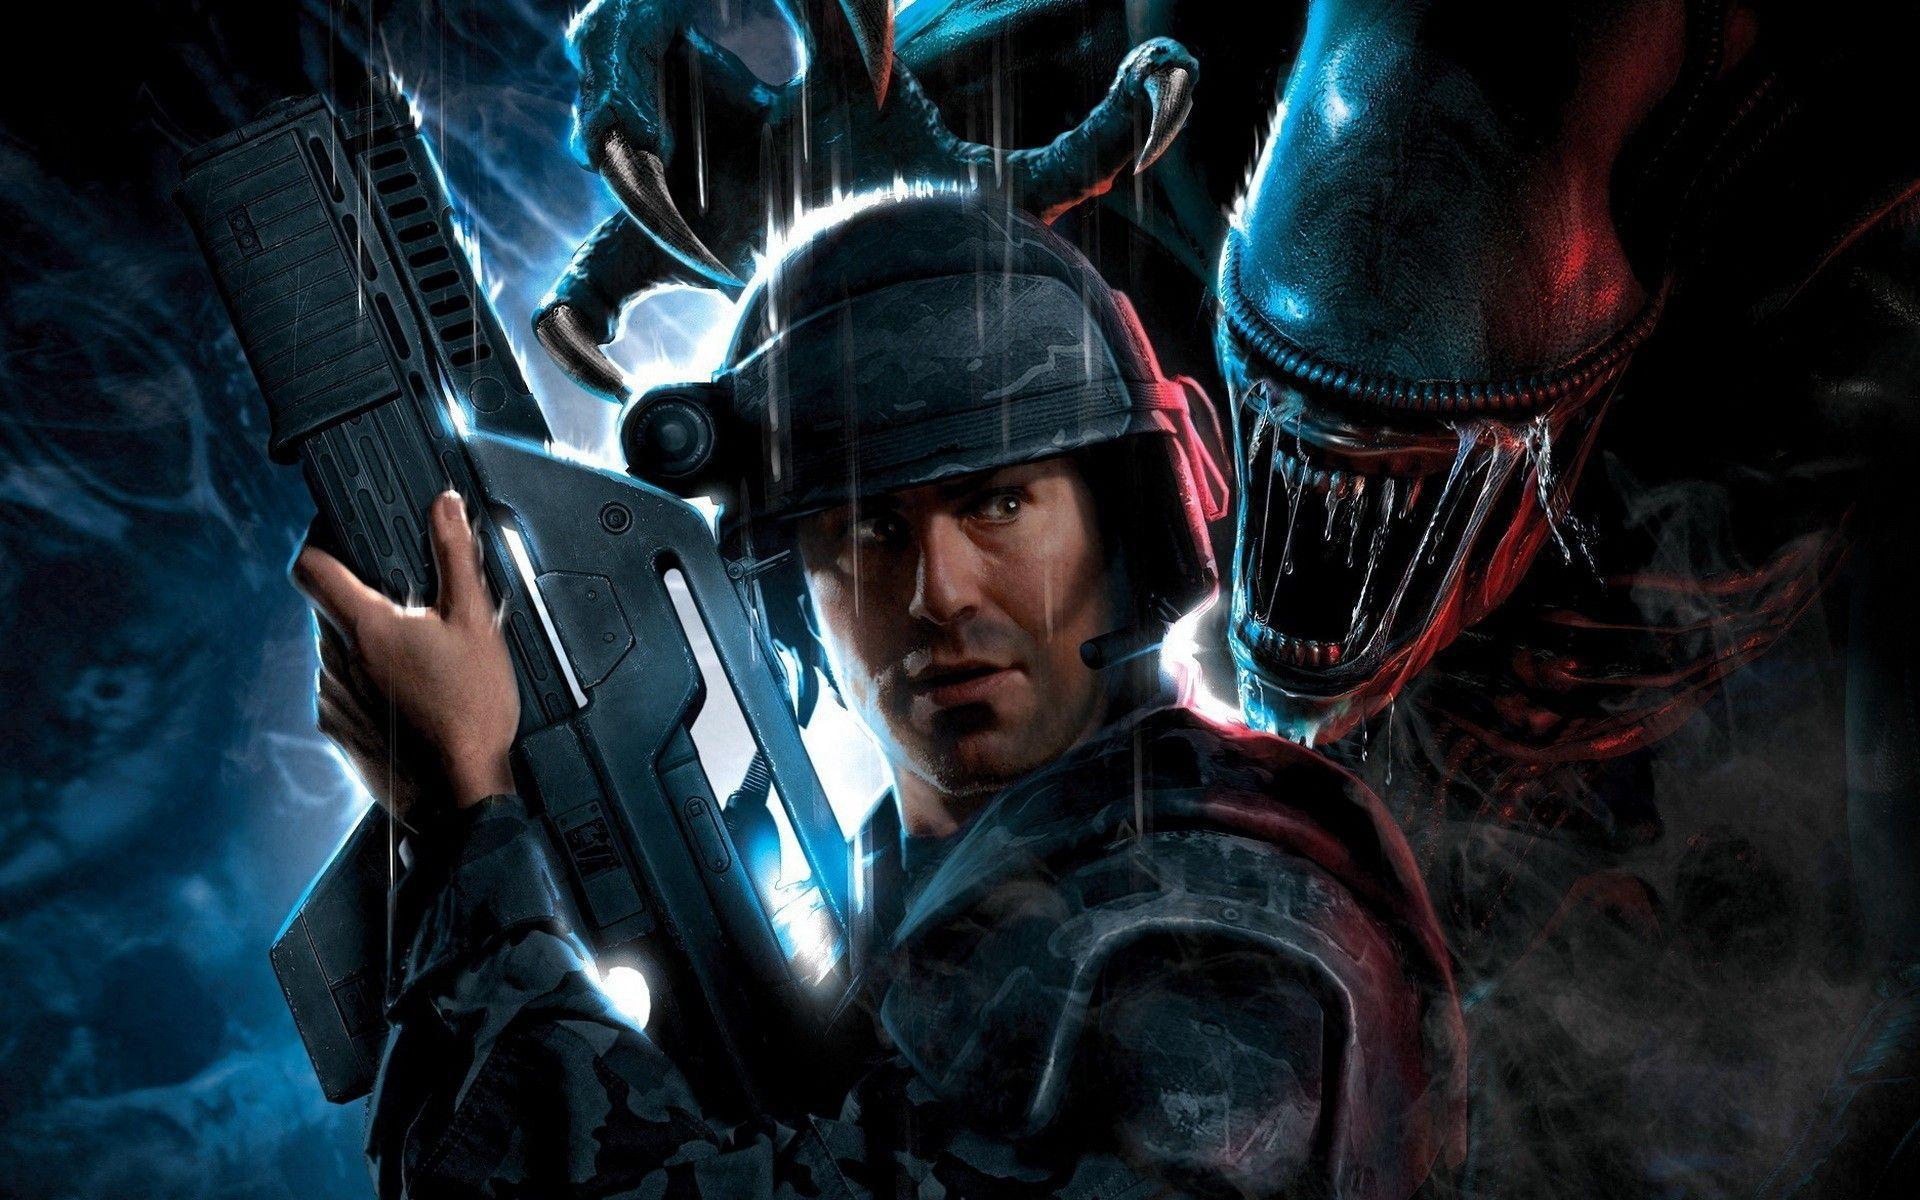 Alien Vs Predator Wallpapers Top Free Alien Vs Predator